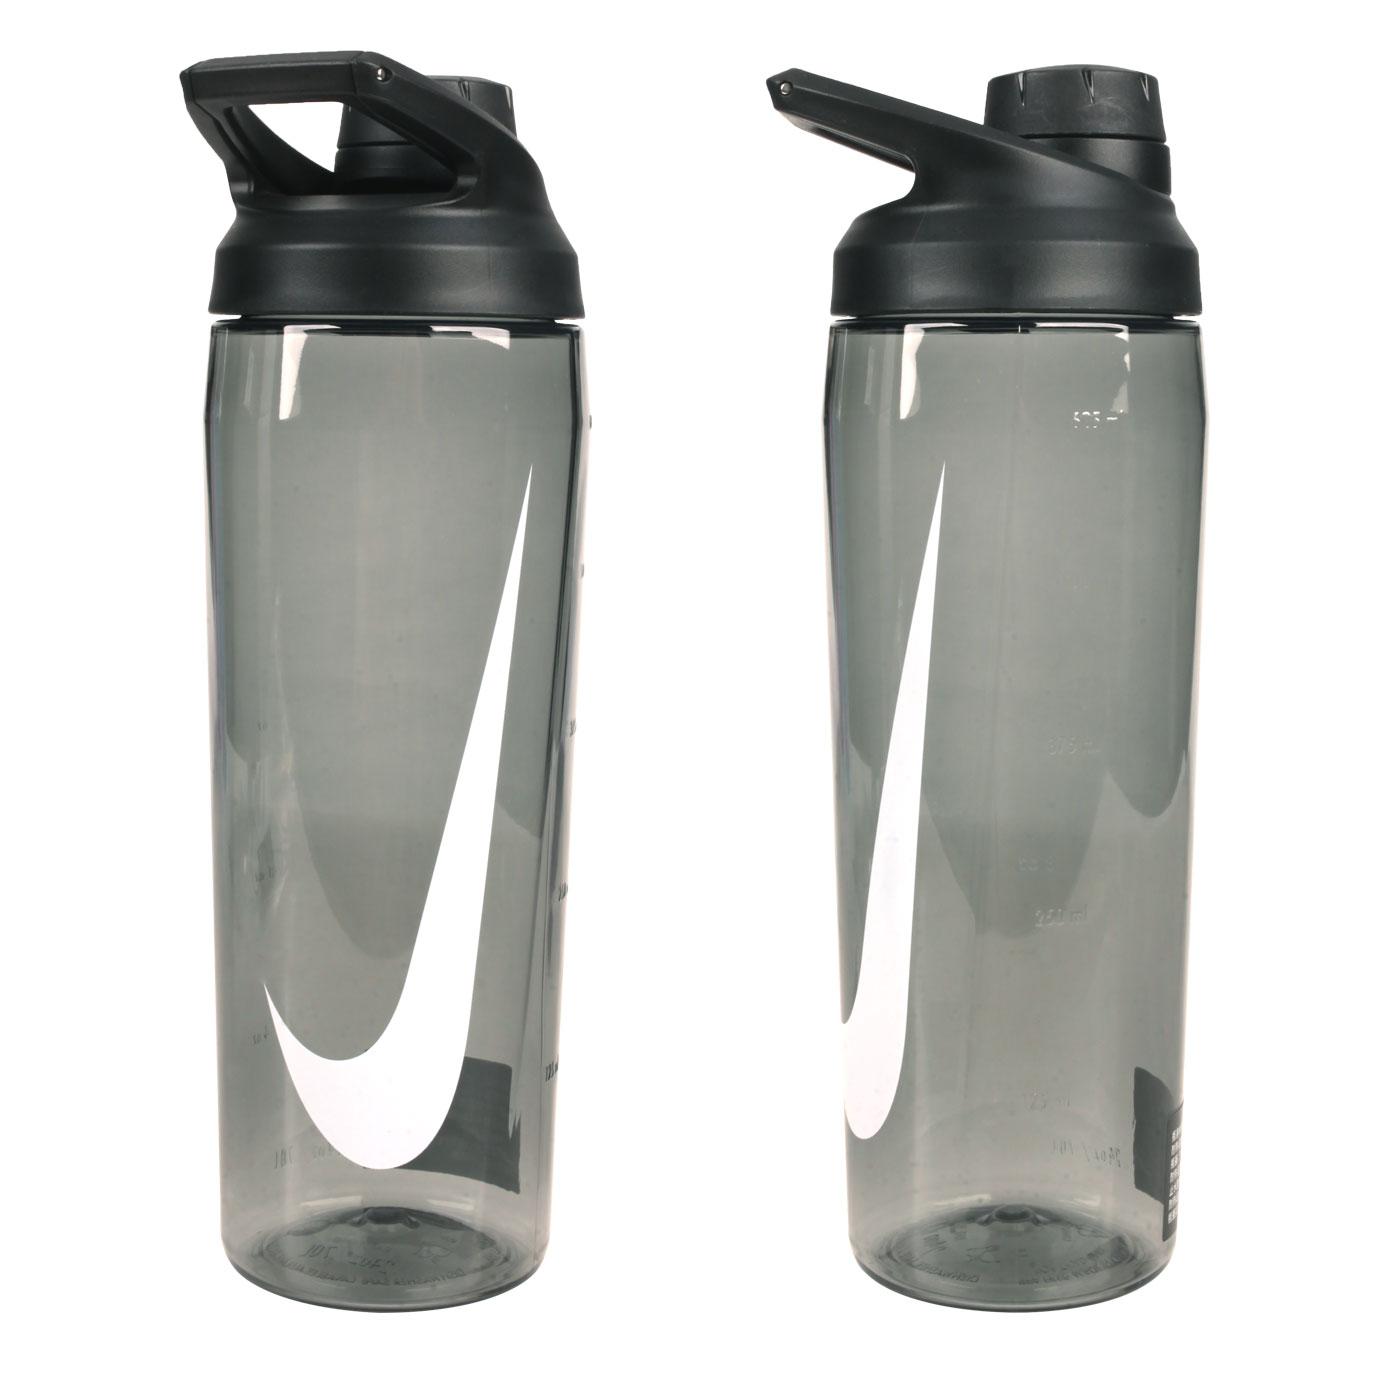 NIKE 24OZ 大口徑水壺 N100062202524 - 黑白